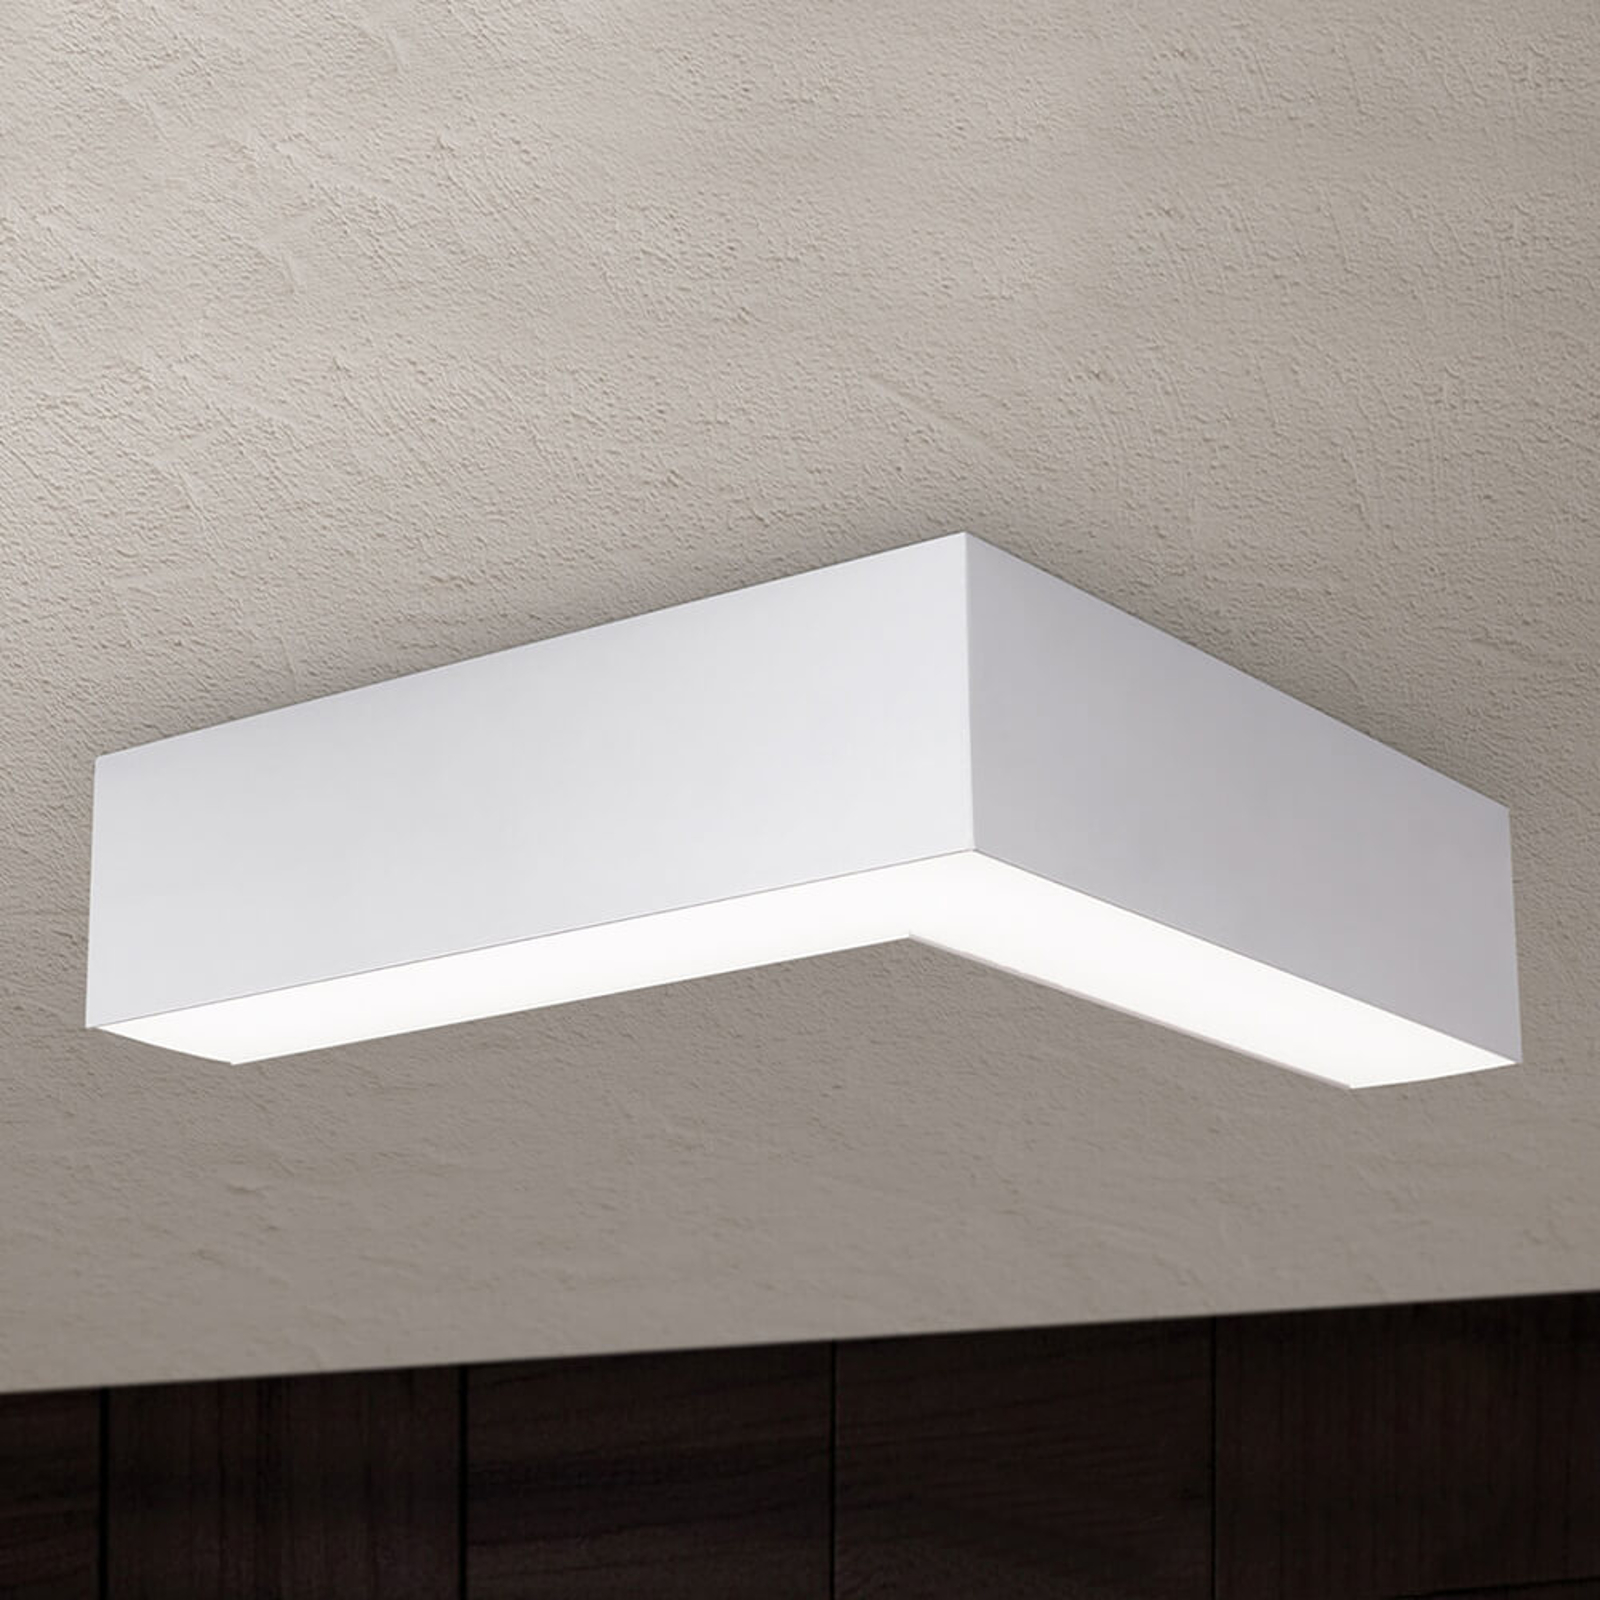 Lampa sufitowa LED Sando, zestaw, 30x30cm